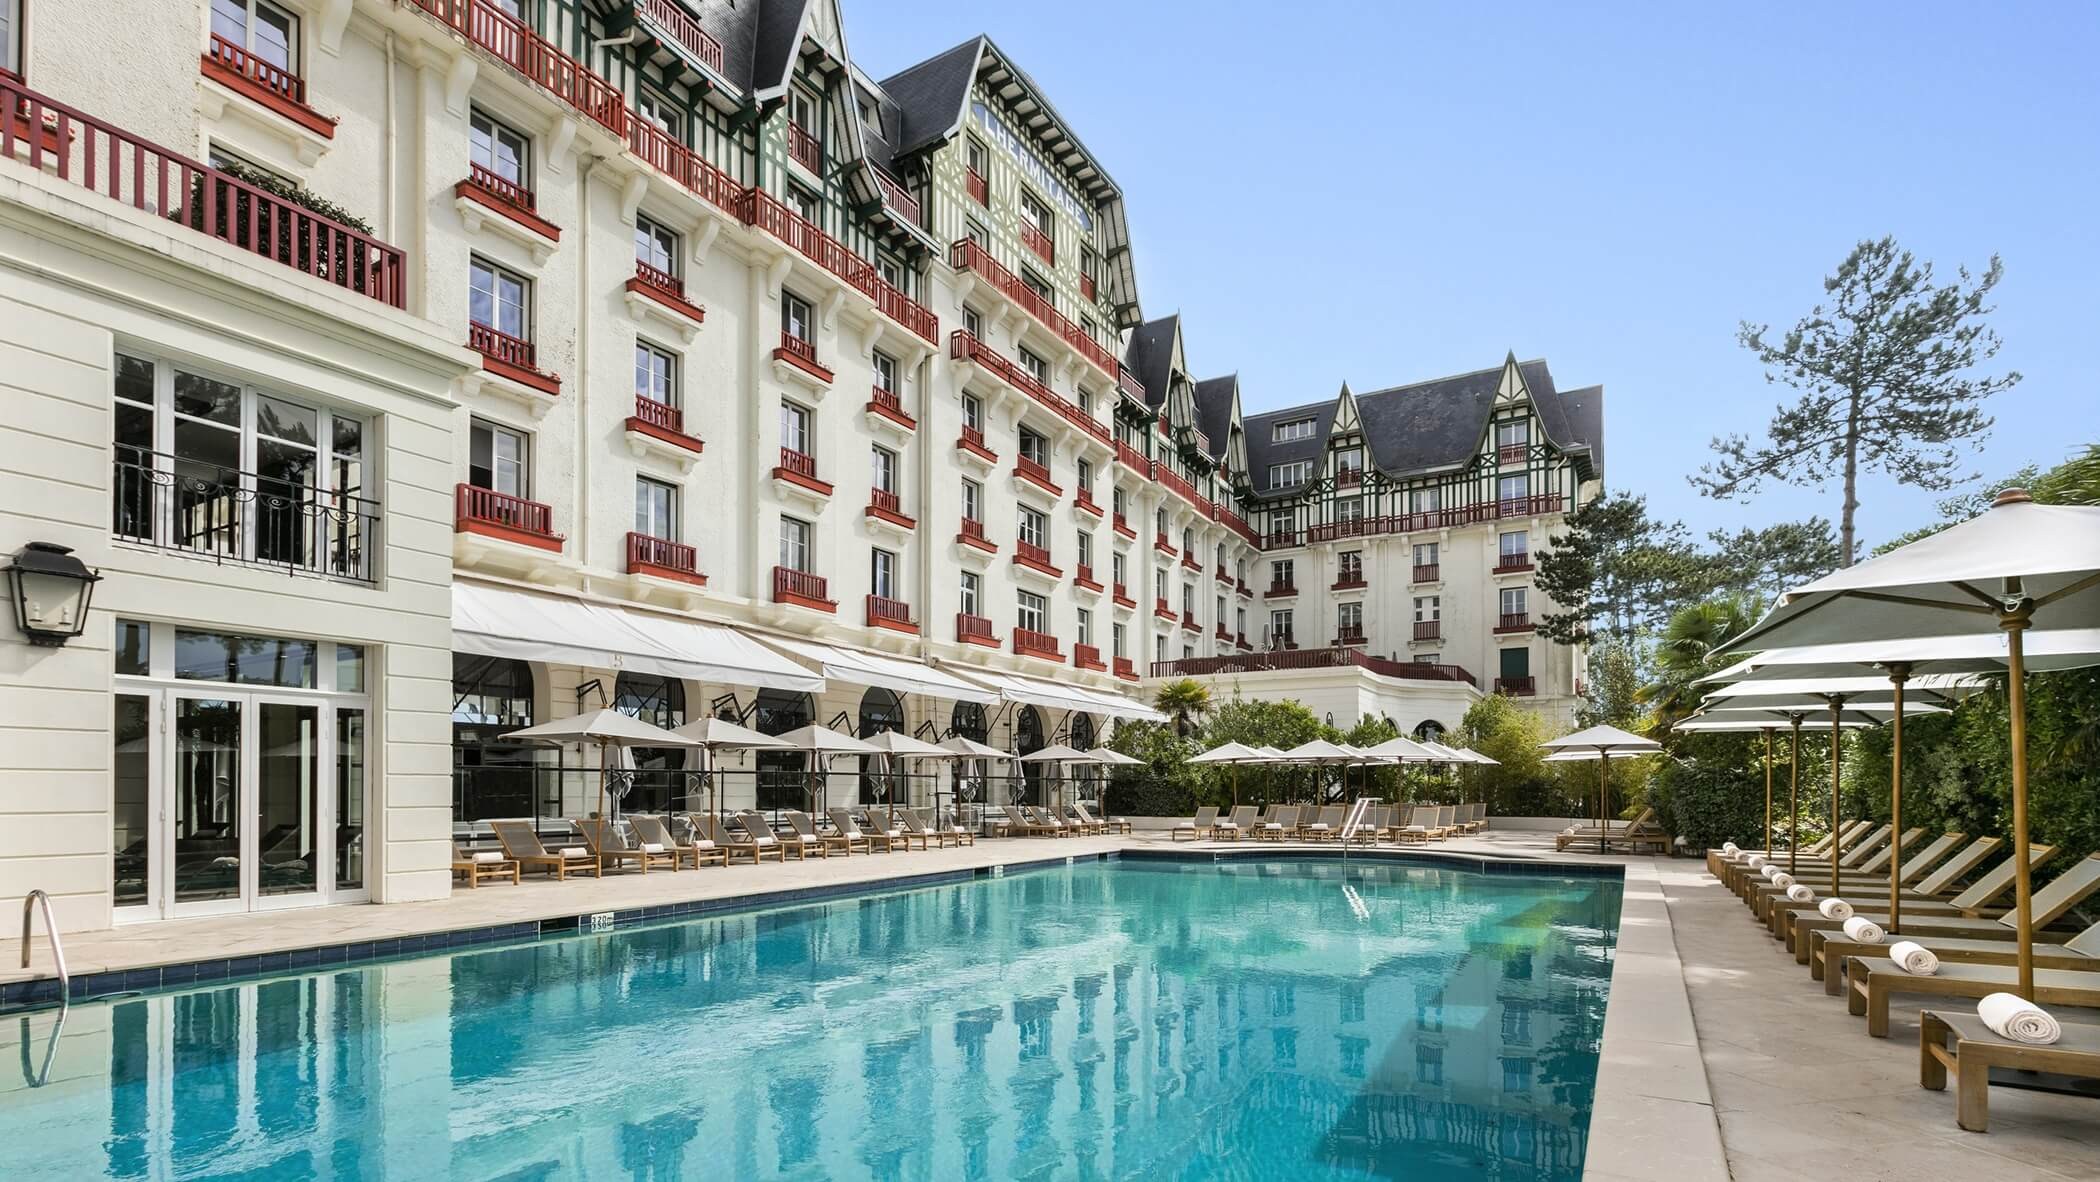 Barrière Hotel l'Hermitage piscine